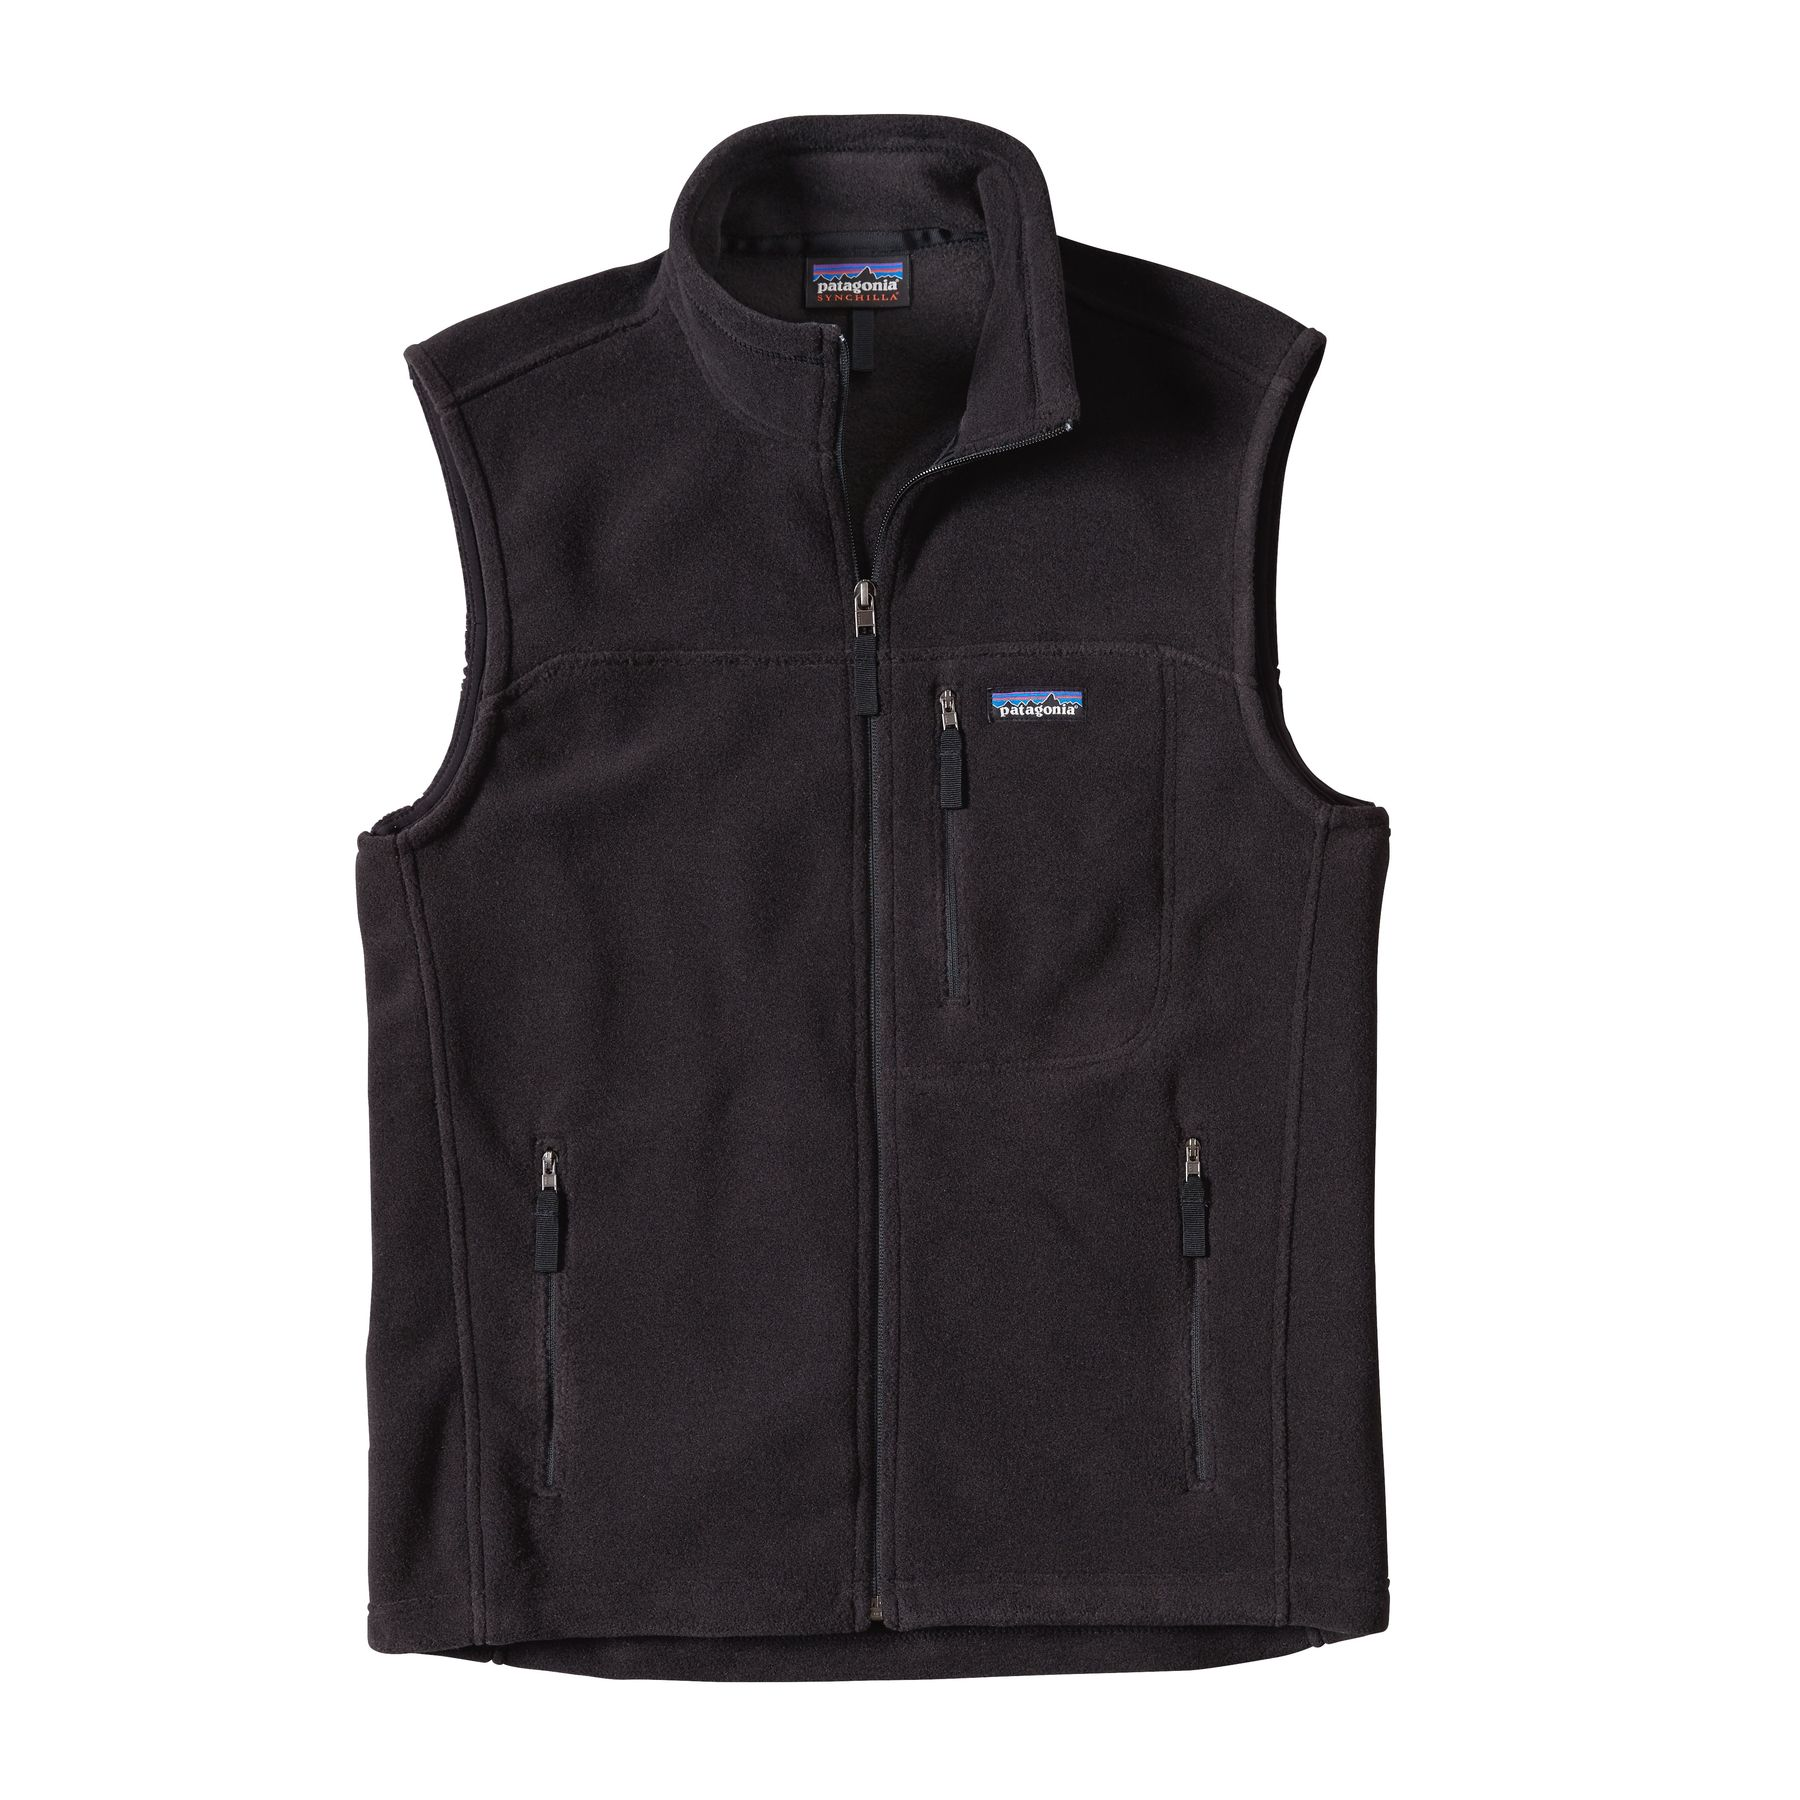 Patagonia - Classic Synchilla® - Fleece vest - Men's